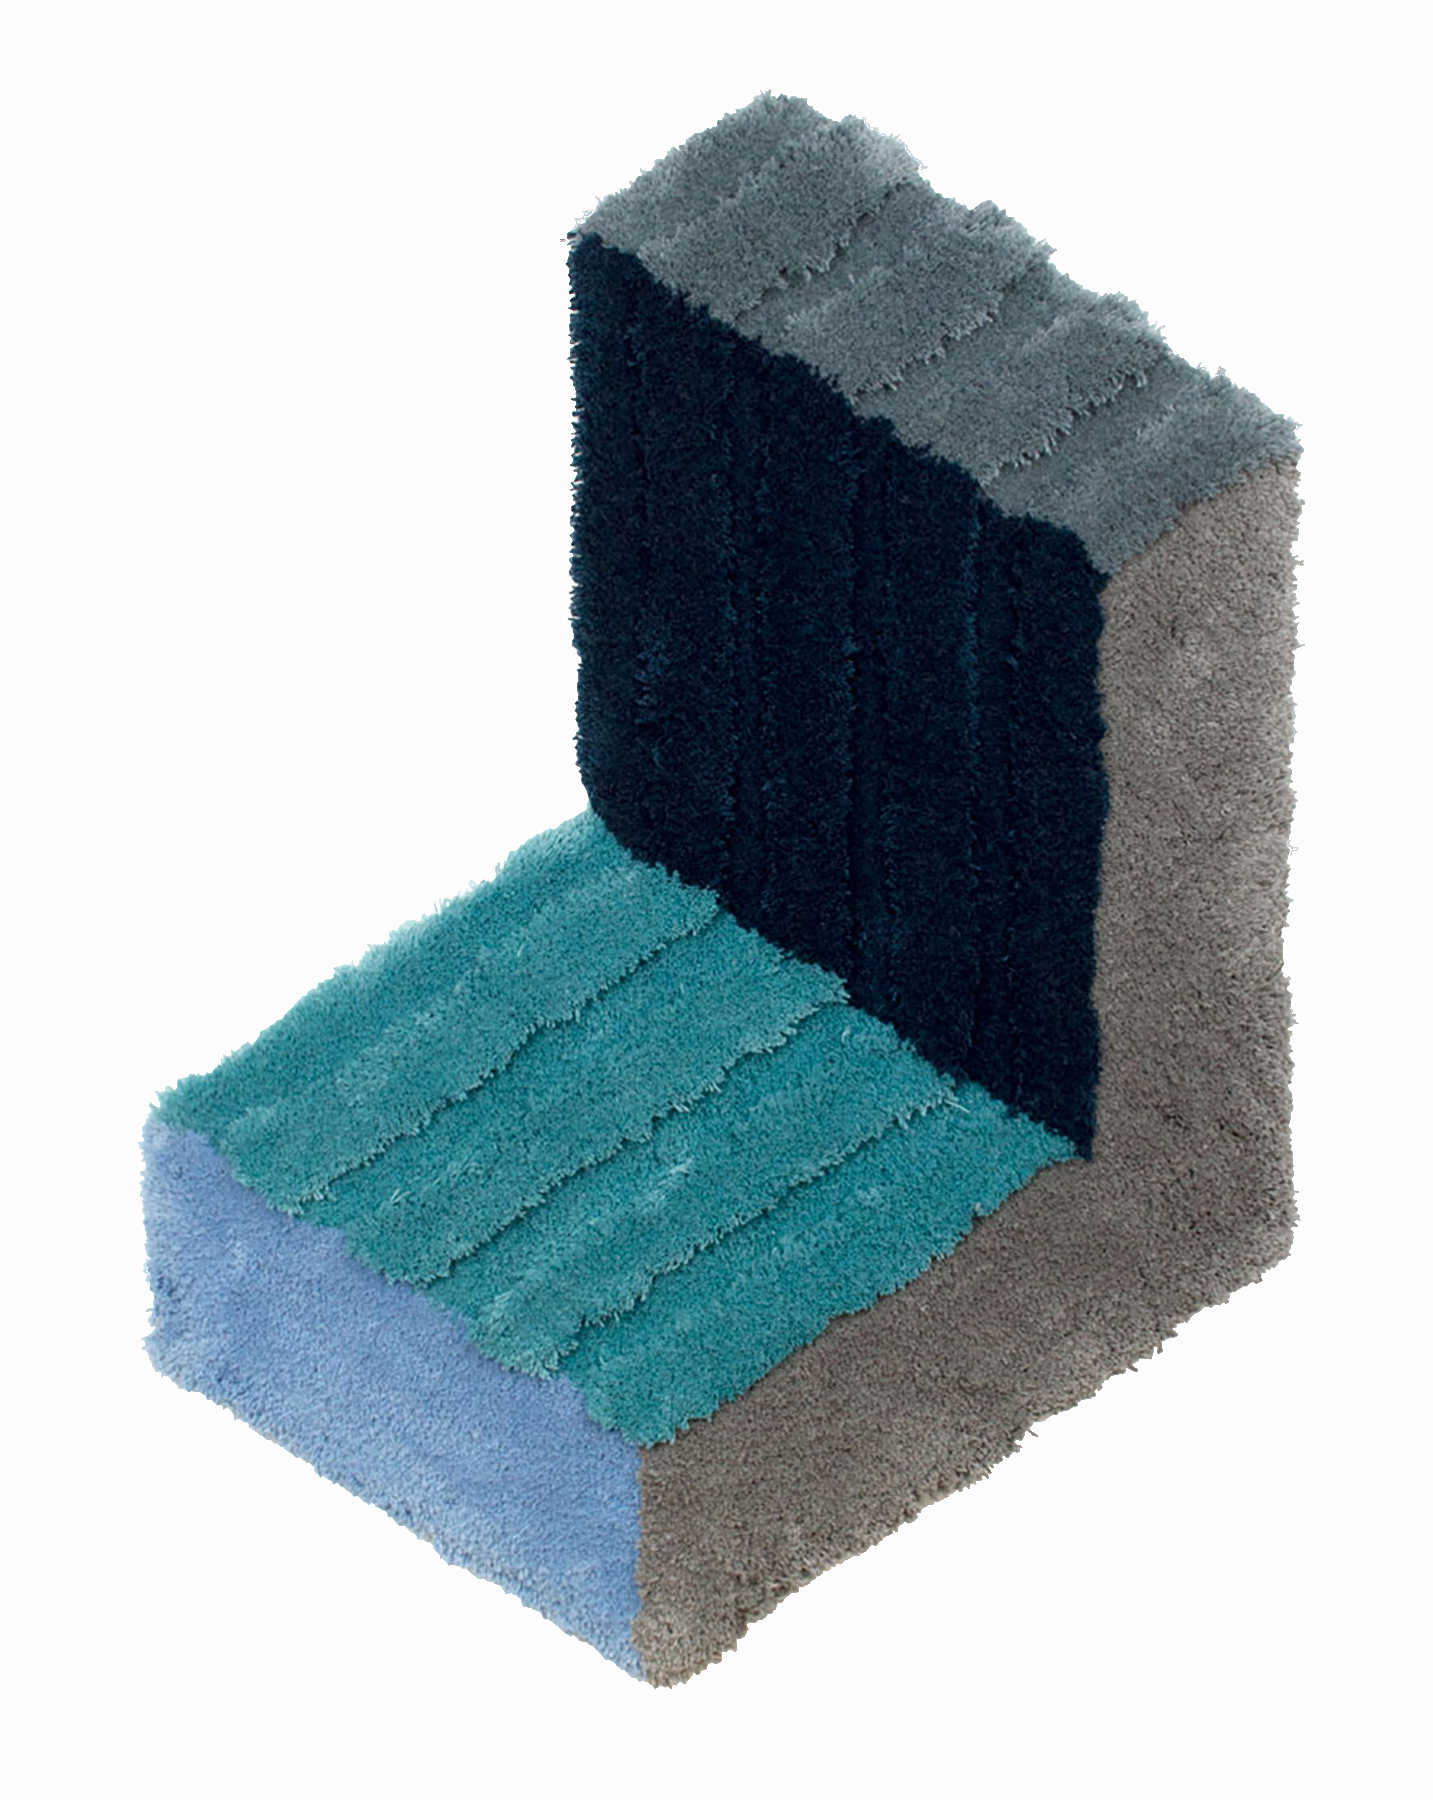 Corner Bracket, 53 x 37.5 inches / 134.6 x 95.3 cm, wool yarn on wood panel, 2019